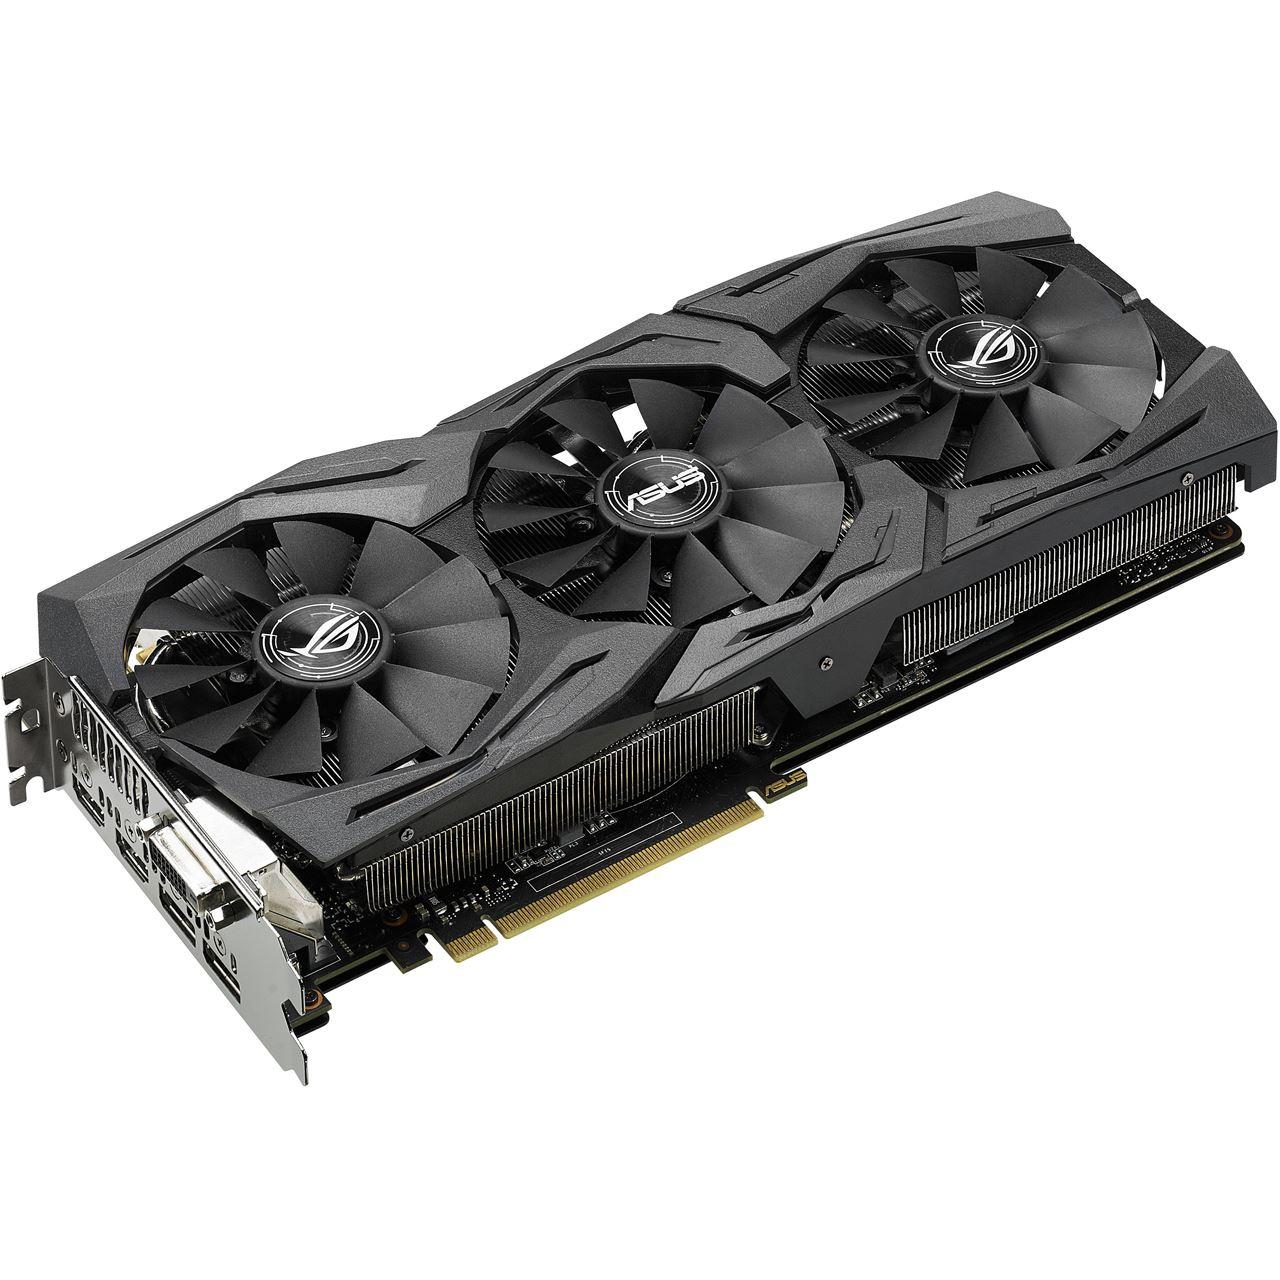 Mindfactory Angebot: 8GB Asus GeForce GTX 1070 Strix OC Aktiv PCIe 3.0 x16 (Retail)